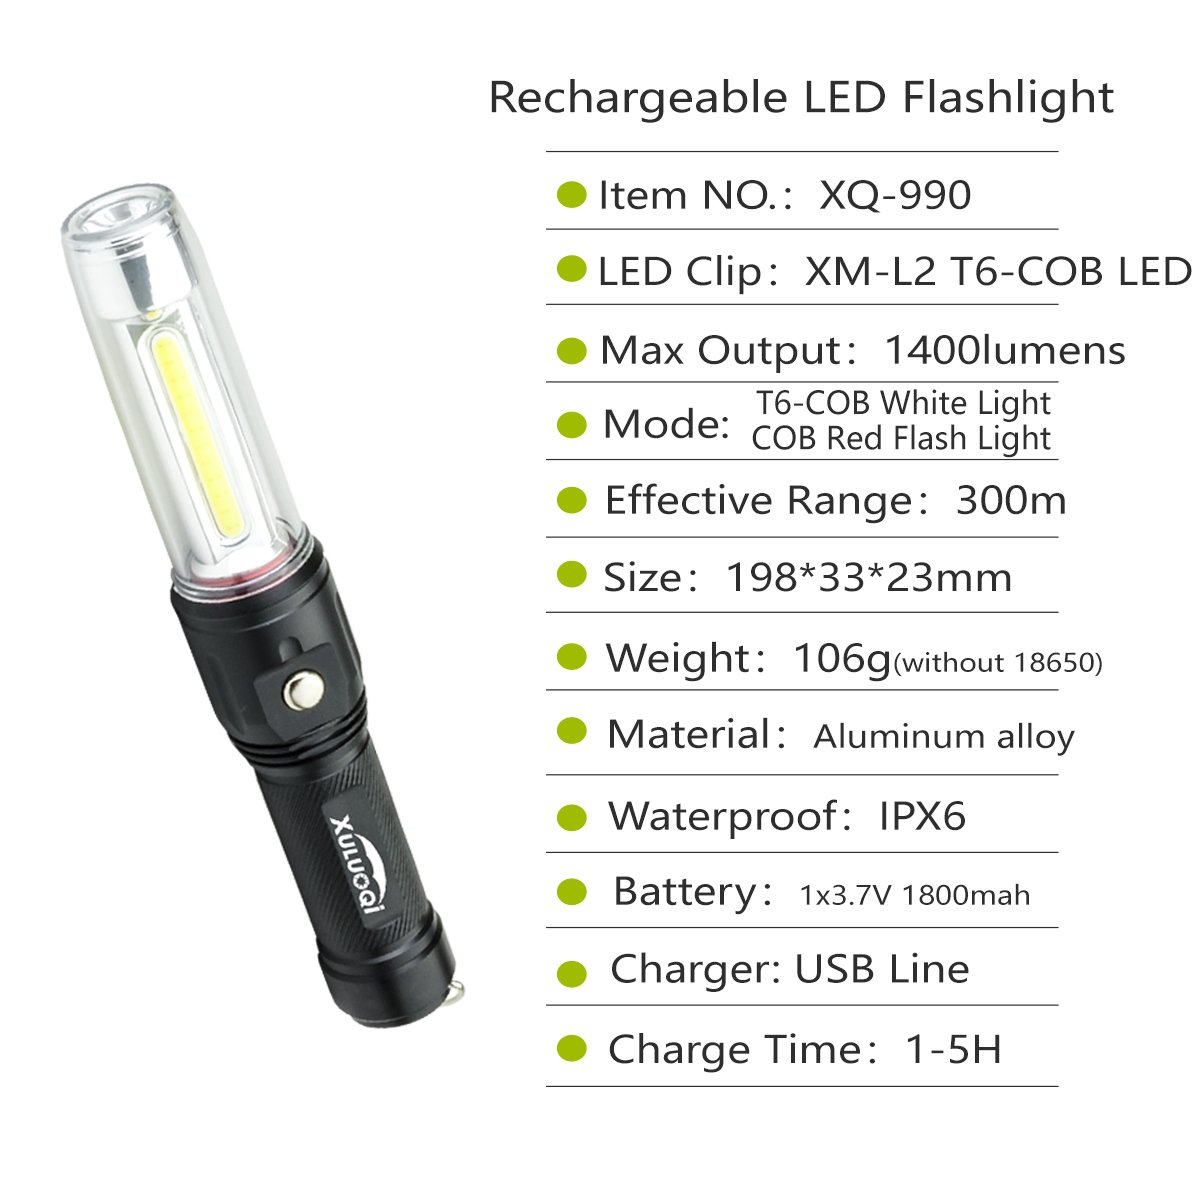 XULUOQI Work Light Super Bright LED Flashlight, Multi-function Flashlight 3 in 1 rechargeable Work Light - 900 Lumens Handheld Emergency Light with Magnetic Base Safety Roadside Light Car Maintenance by XULUOQI (Image #7)